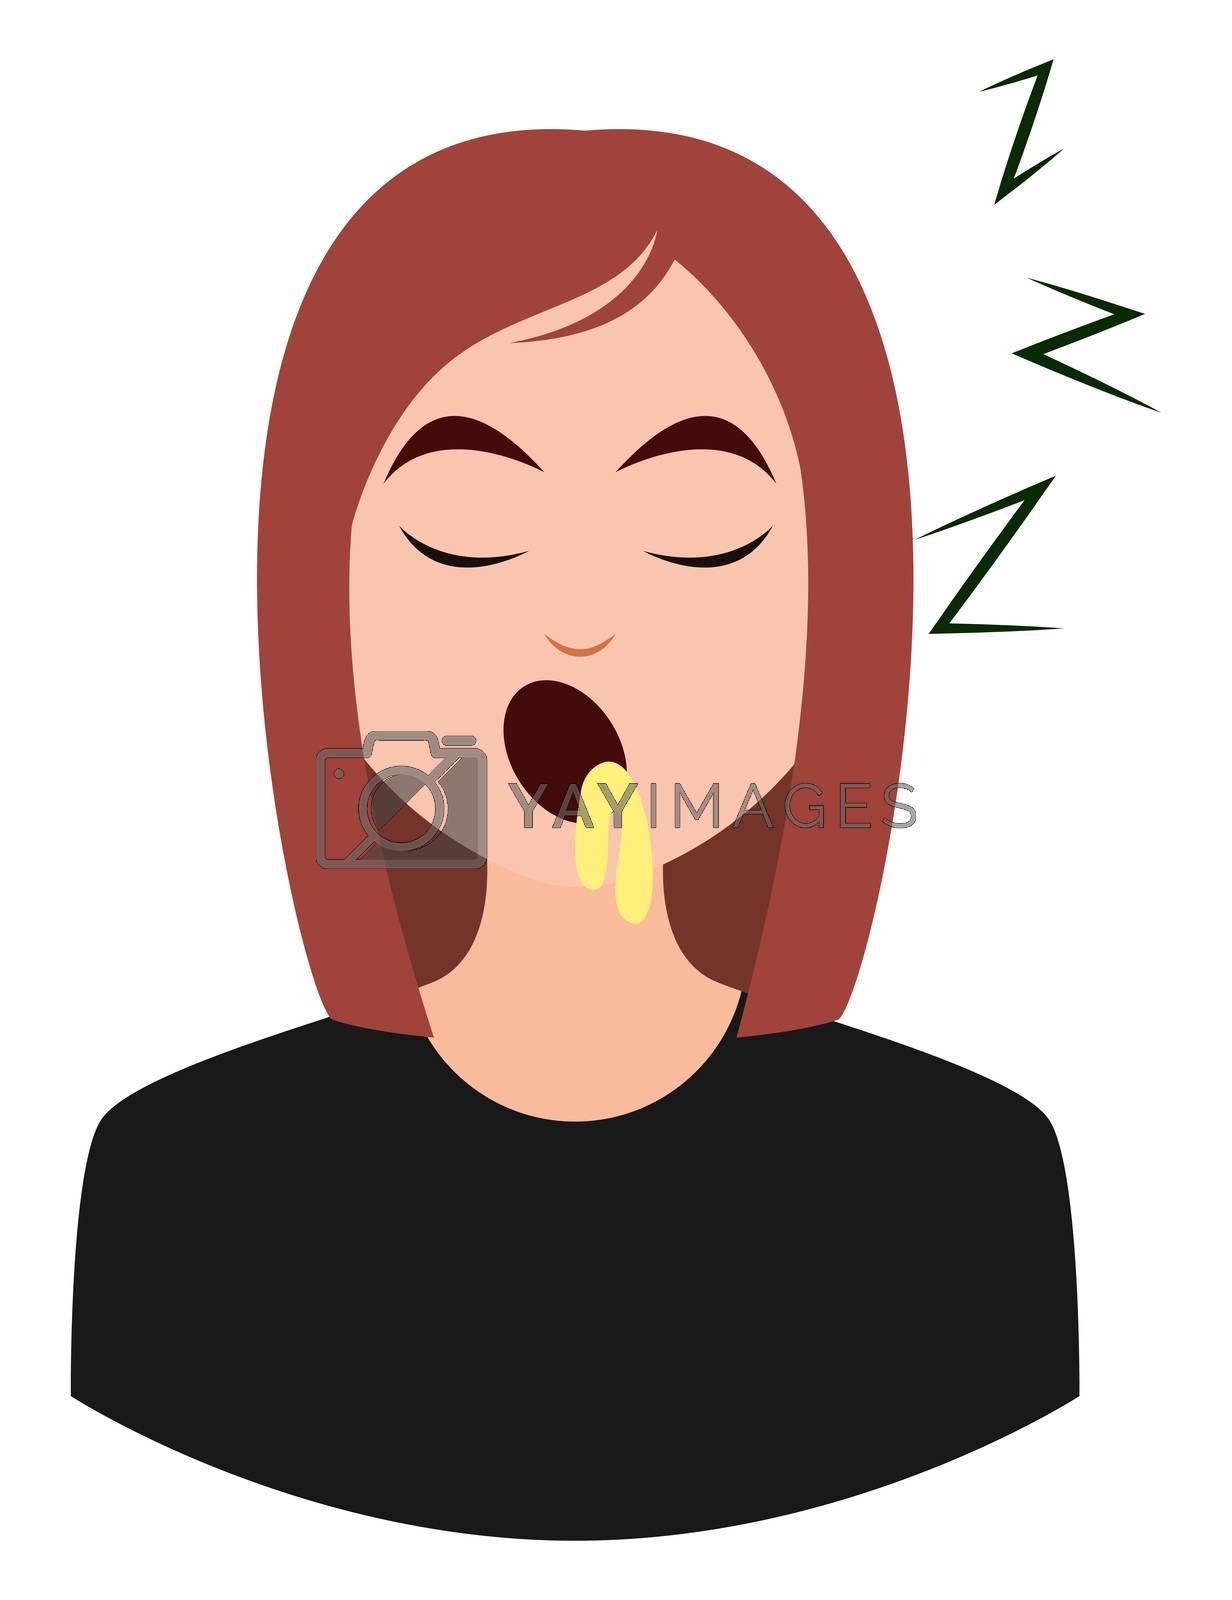 Sleepy girl emoji, illustration, vector on white background